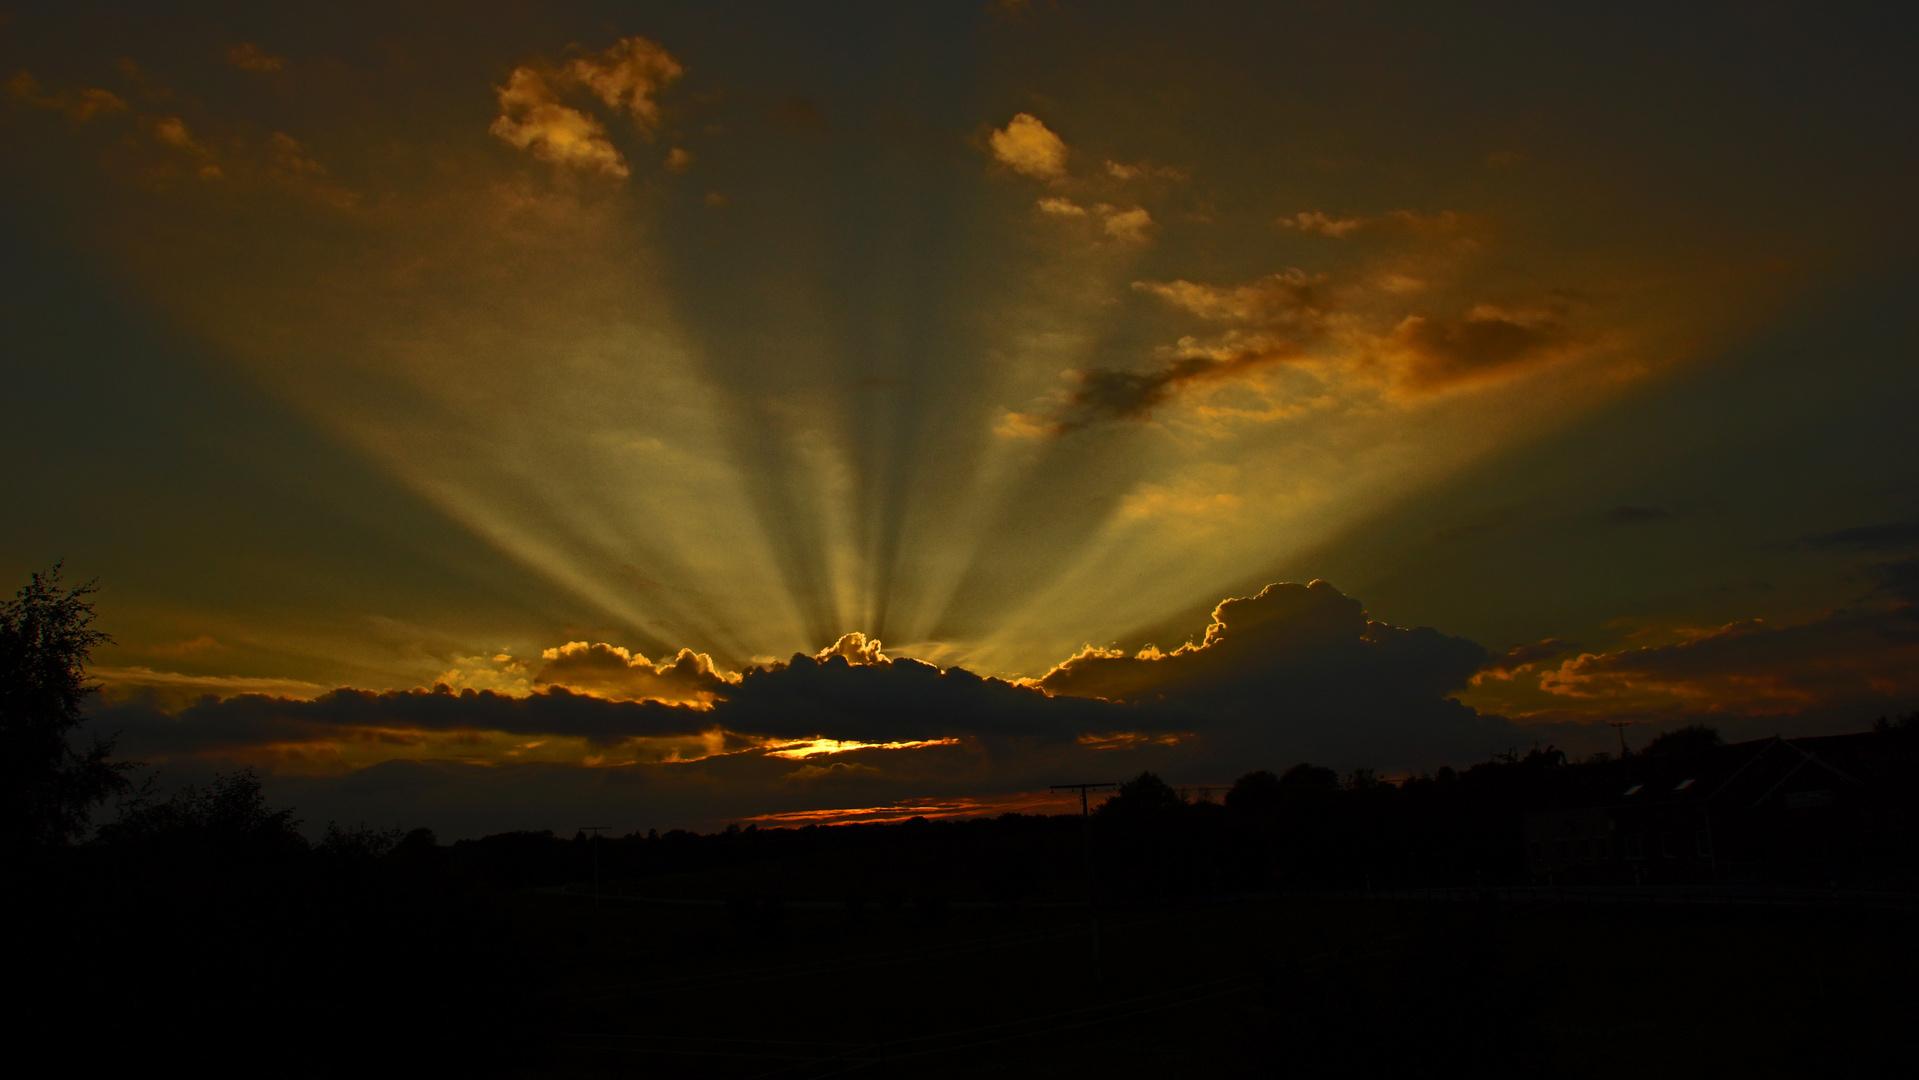 Sonnenuntergang in Wangels an der Ostsee 1